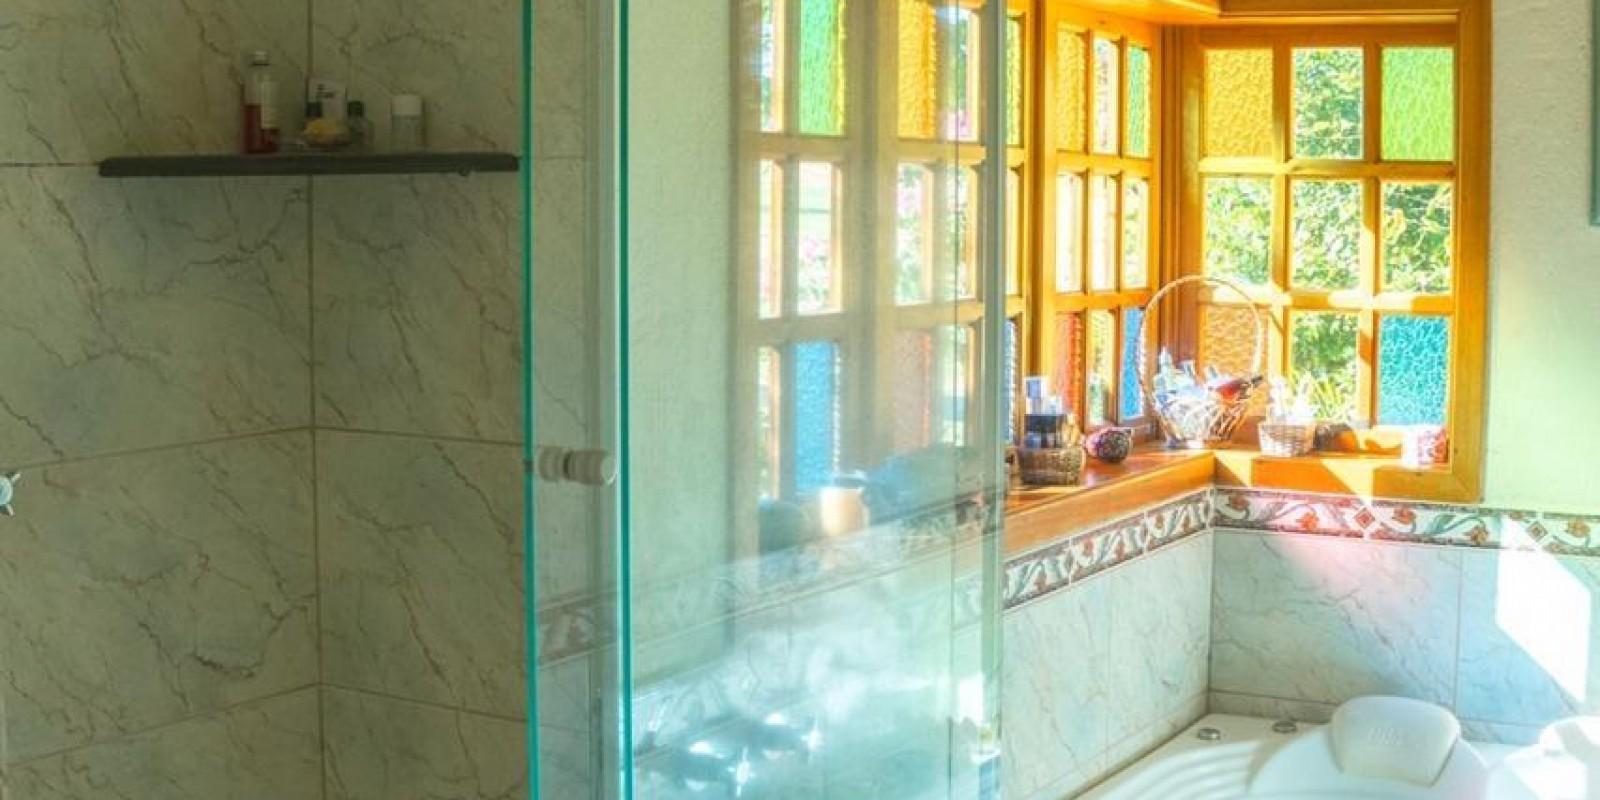 Casa na Represa no Condomínio Riviera Sta Cristina XIII  - Foto 26 de 39